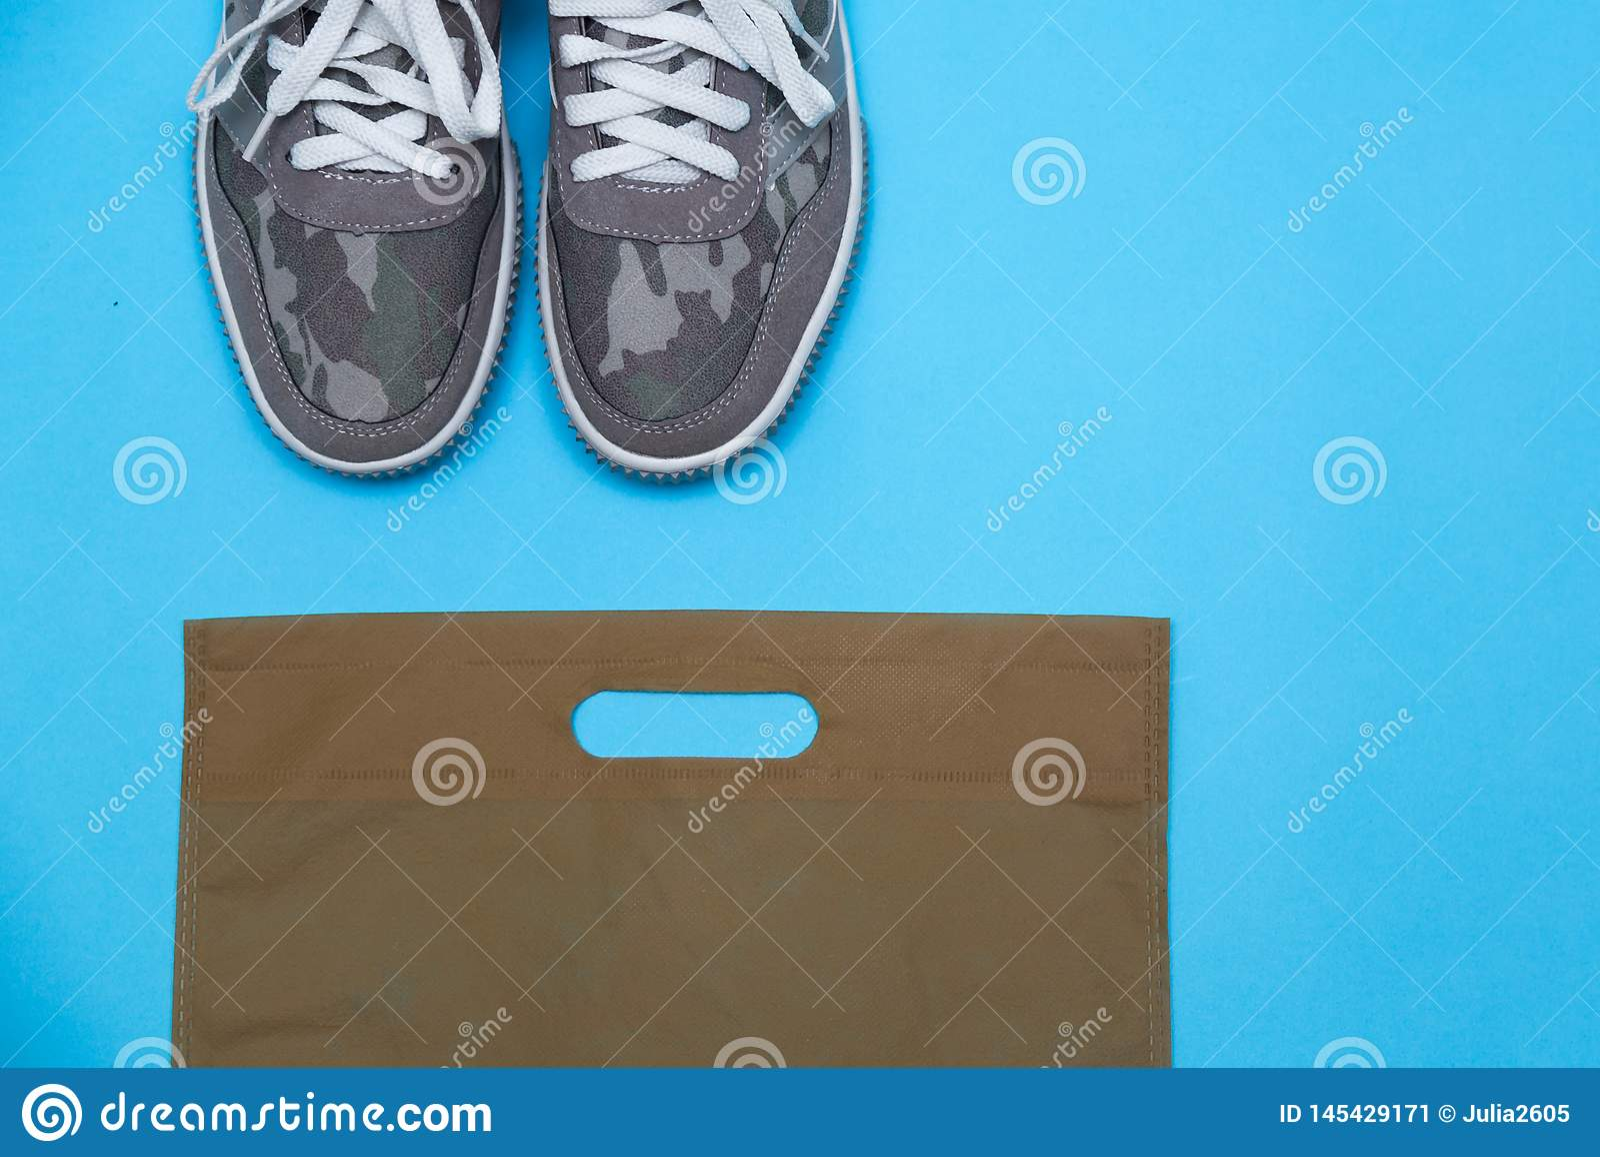 Khaki color sneakers